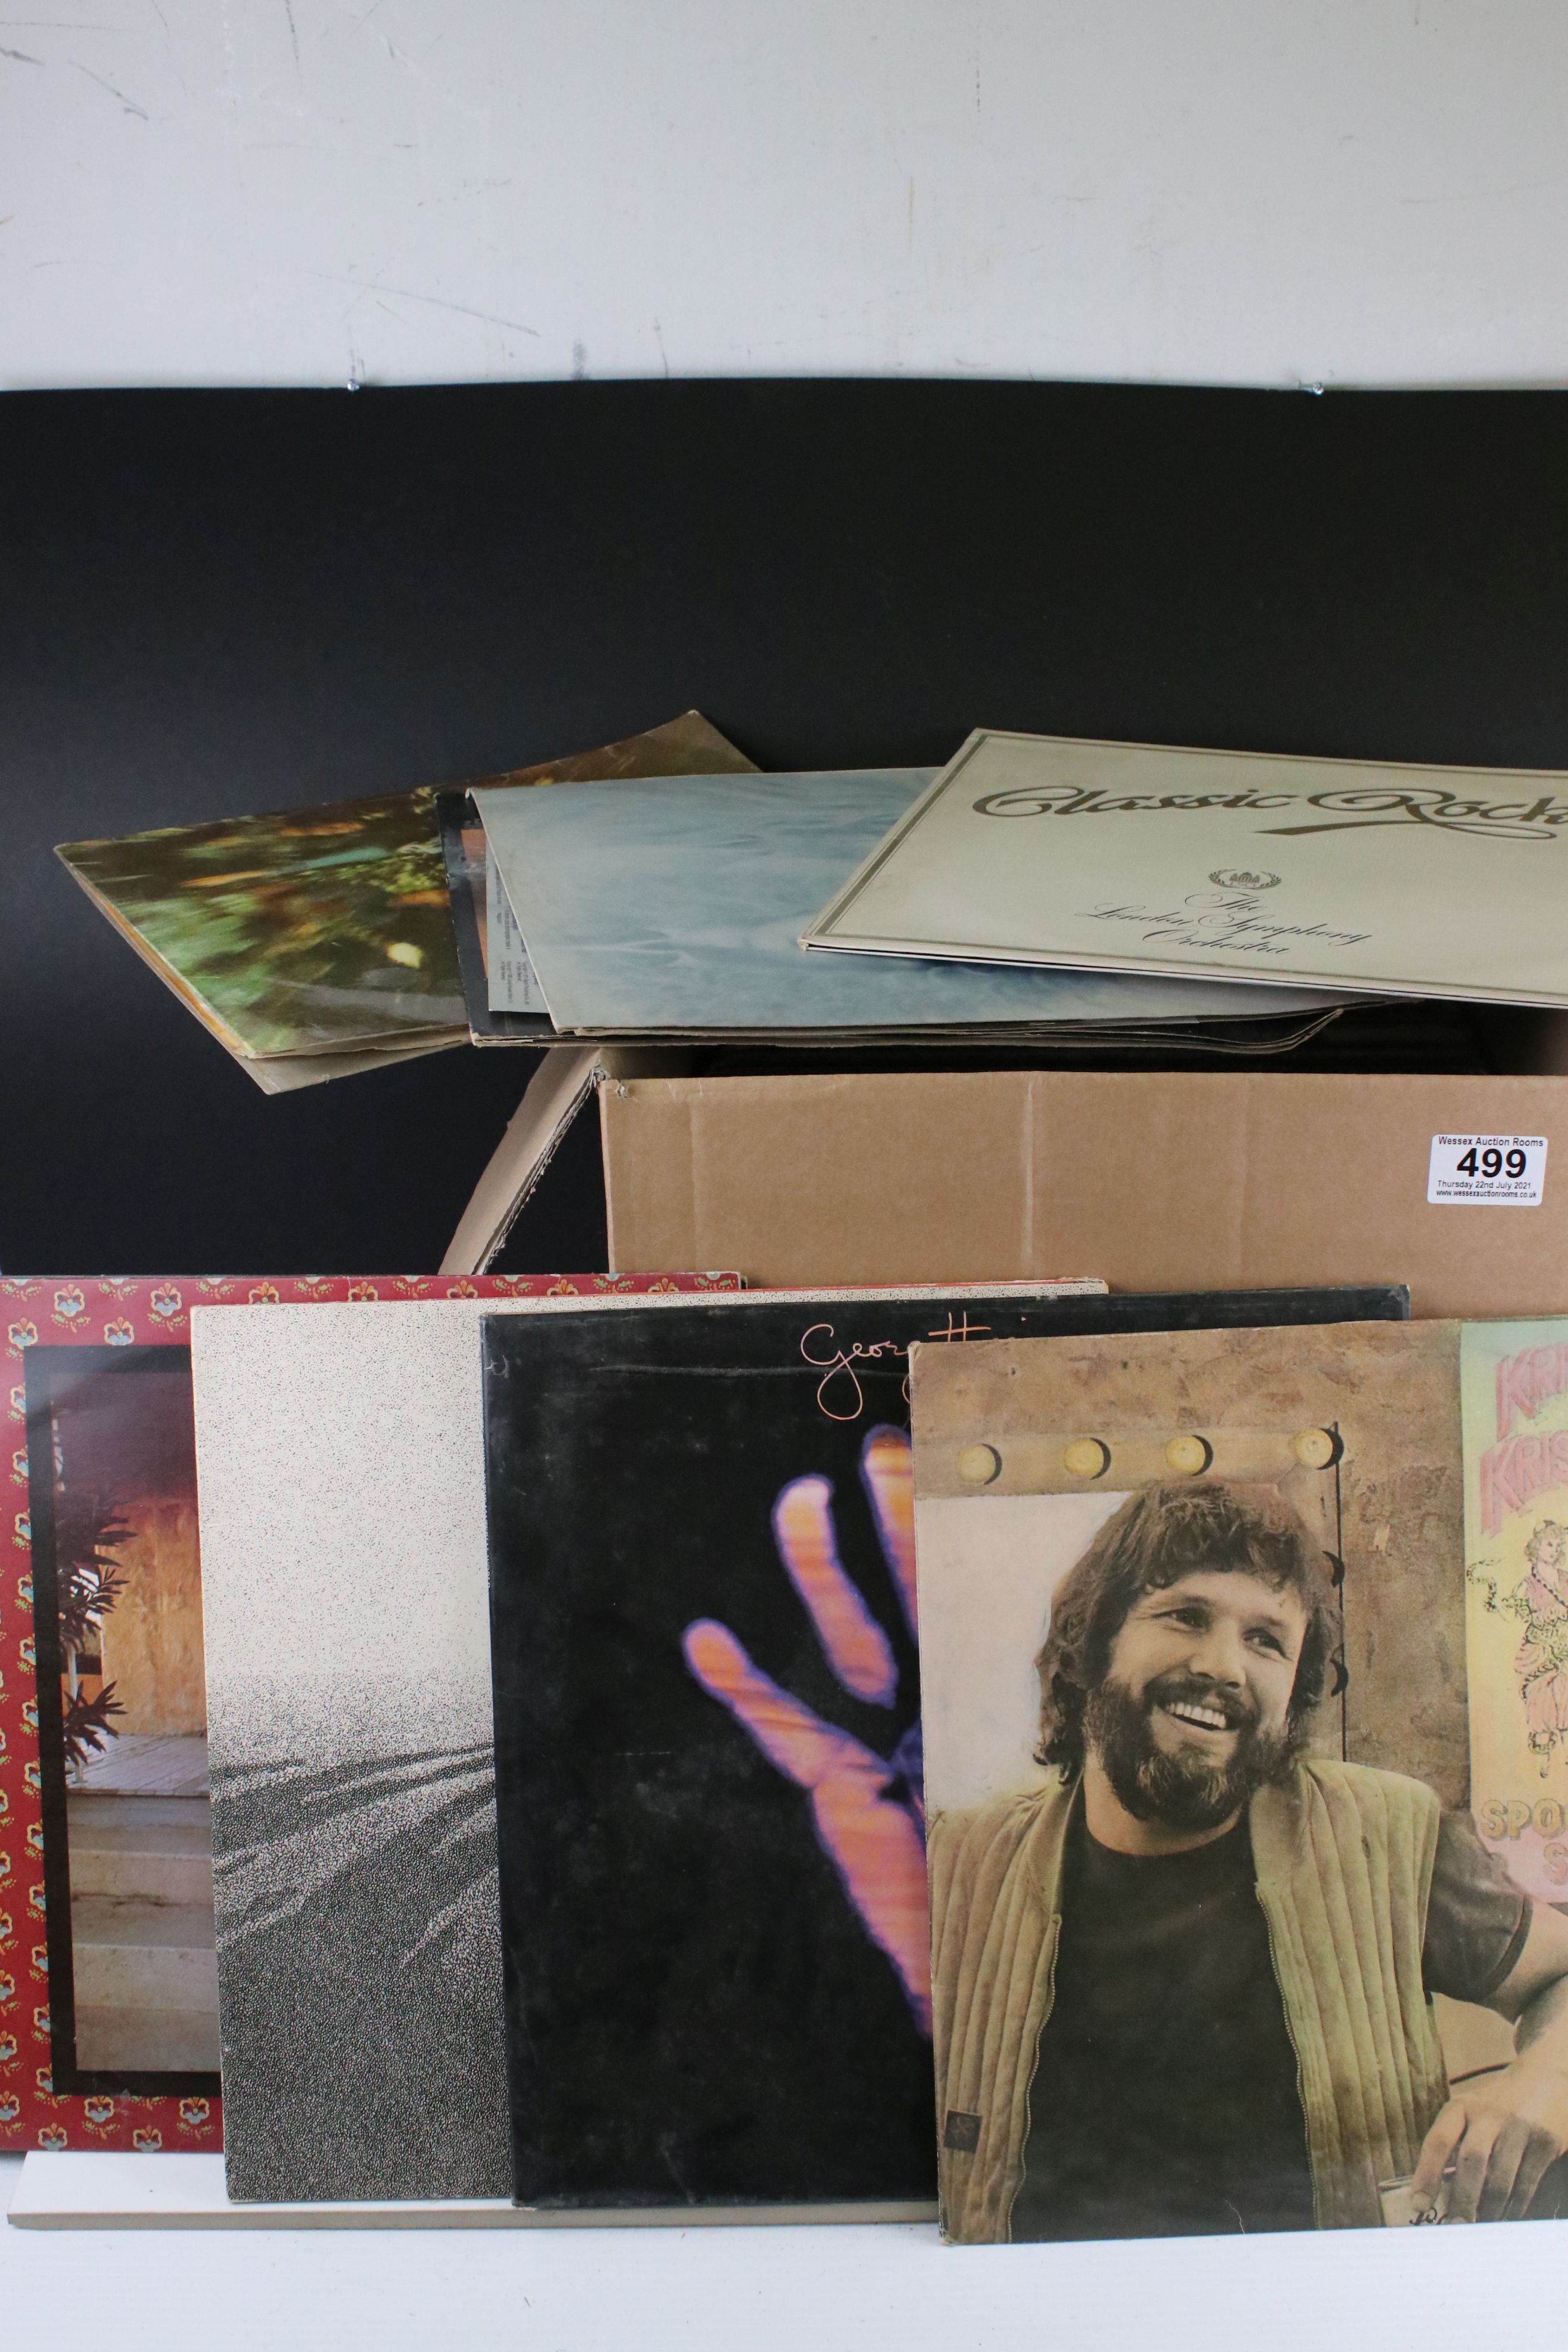 Vinyl - Rock & Pop collection of approx 45 LP's featuring Cat Stevens, Bad Company, Fleetwood Mac,